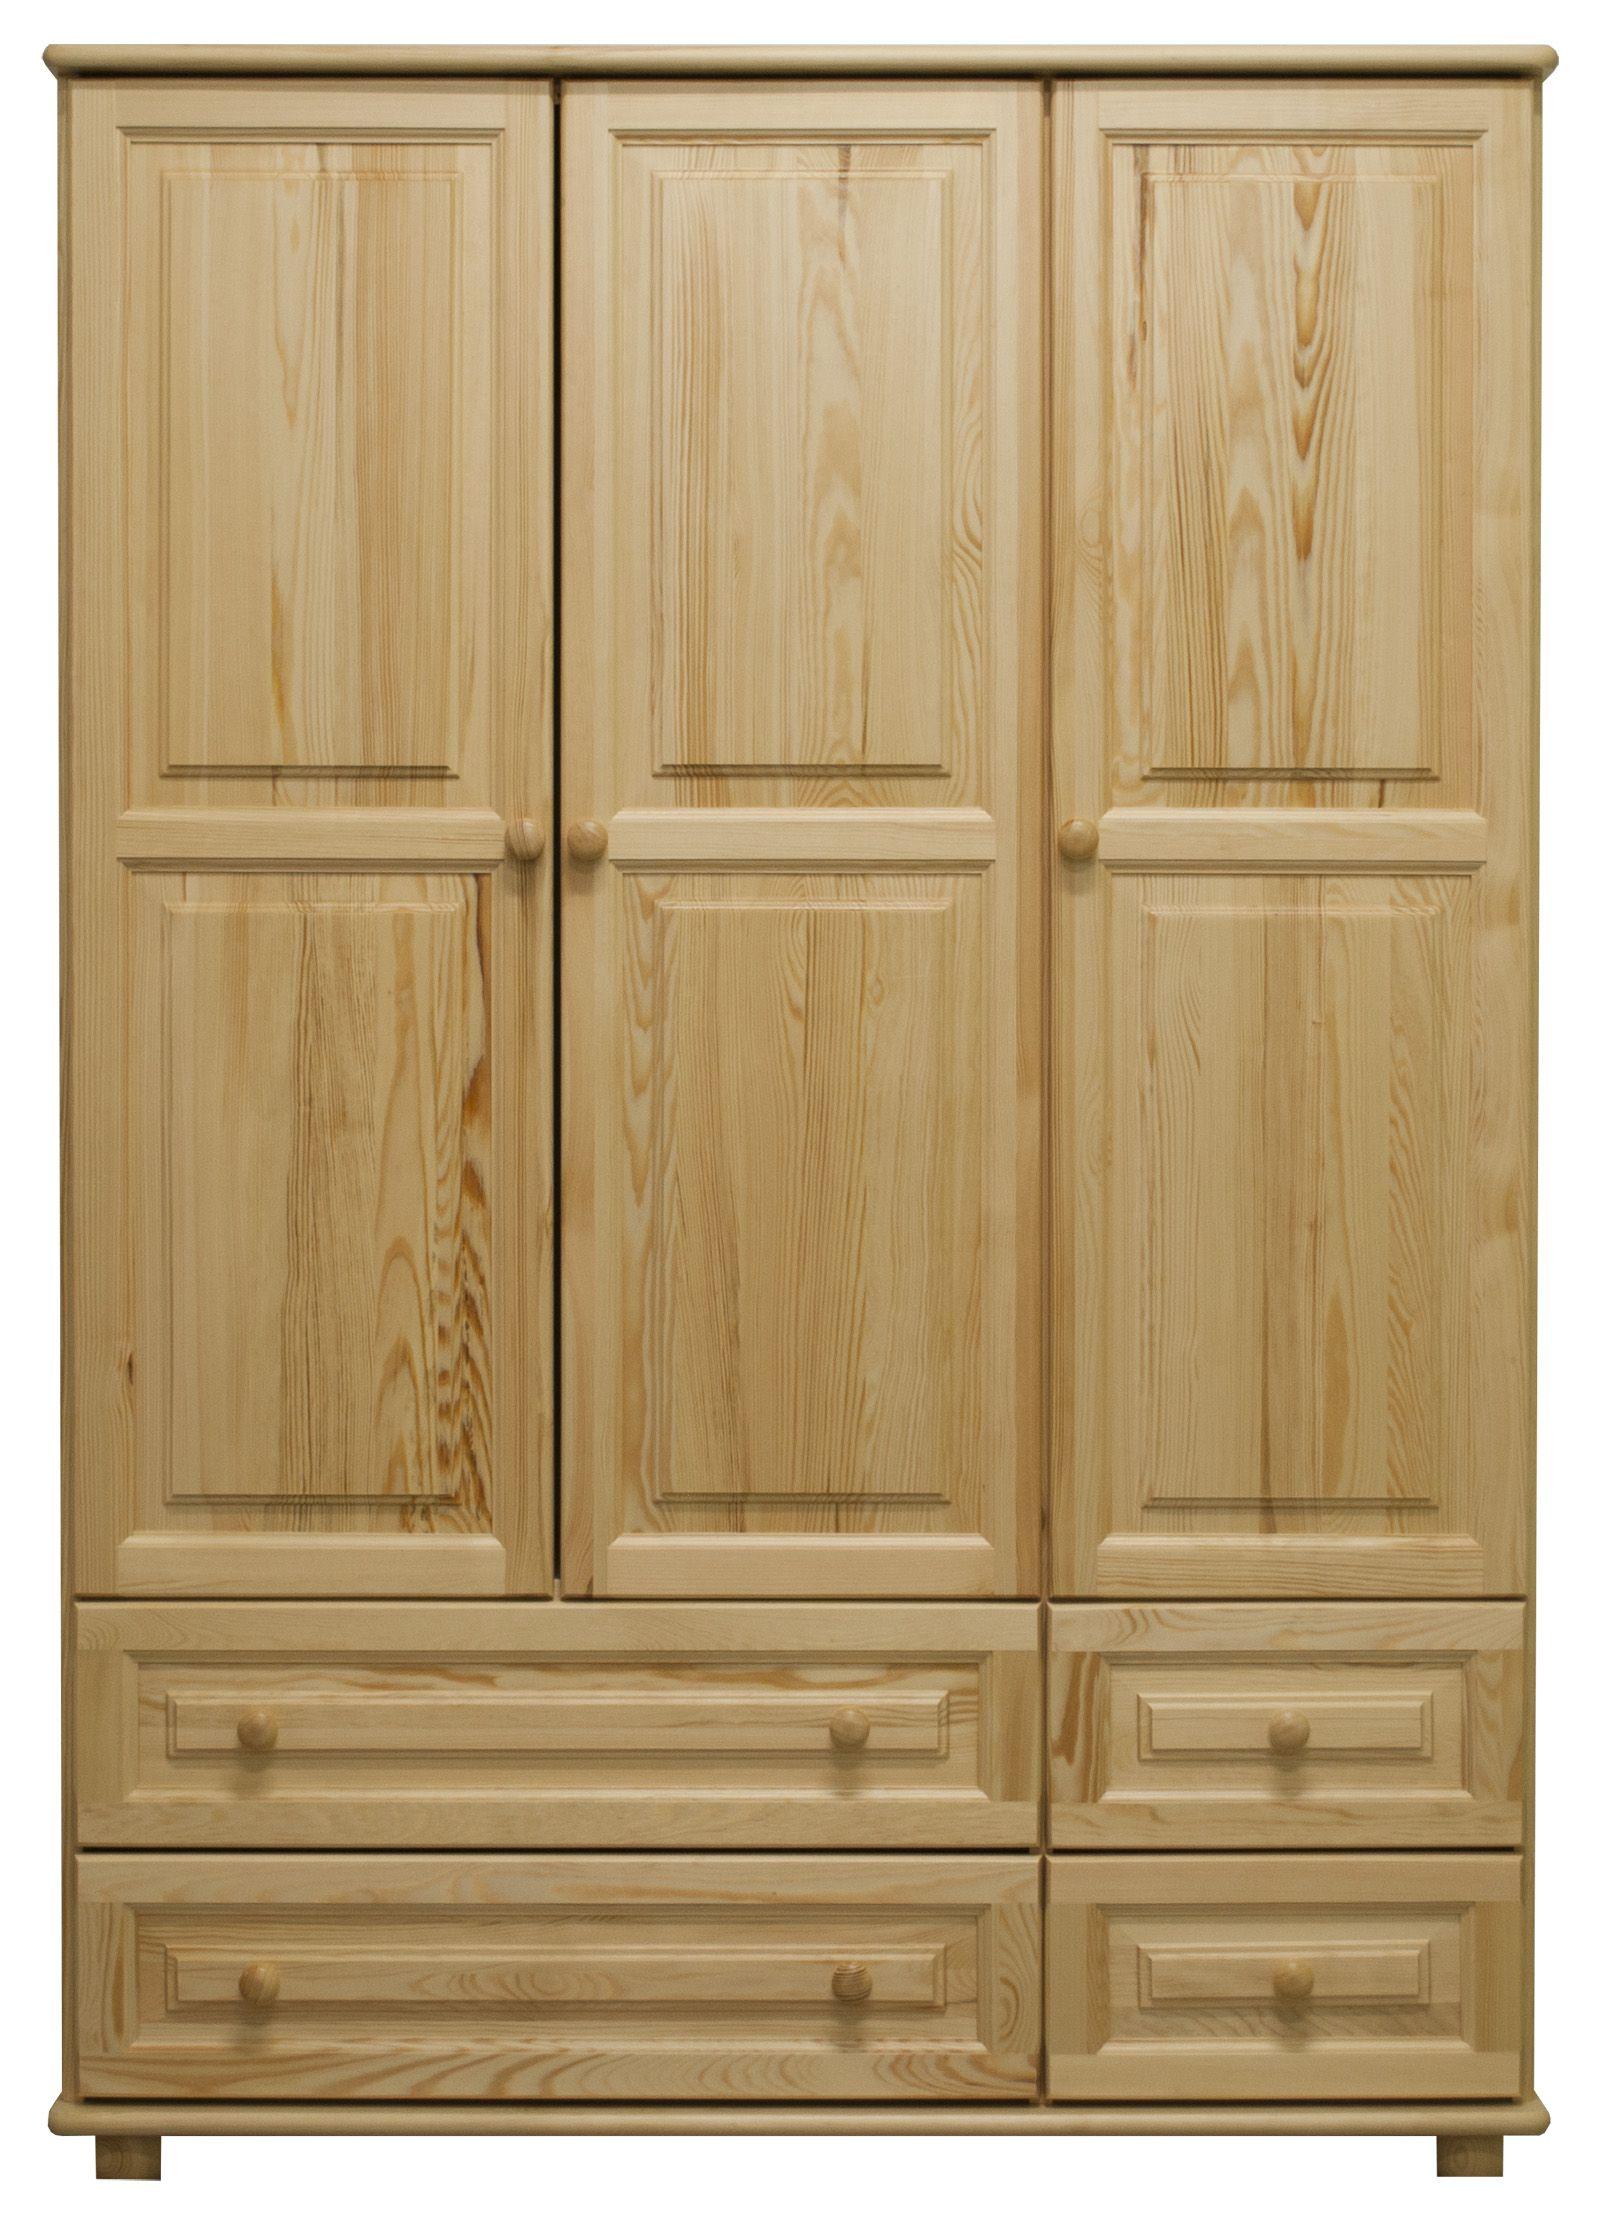 Kledingkast massief grenenhout natuur 017 - Afmetingen 190 x 133 x 60 cm (H x B x D)